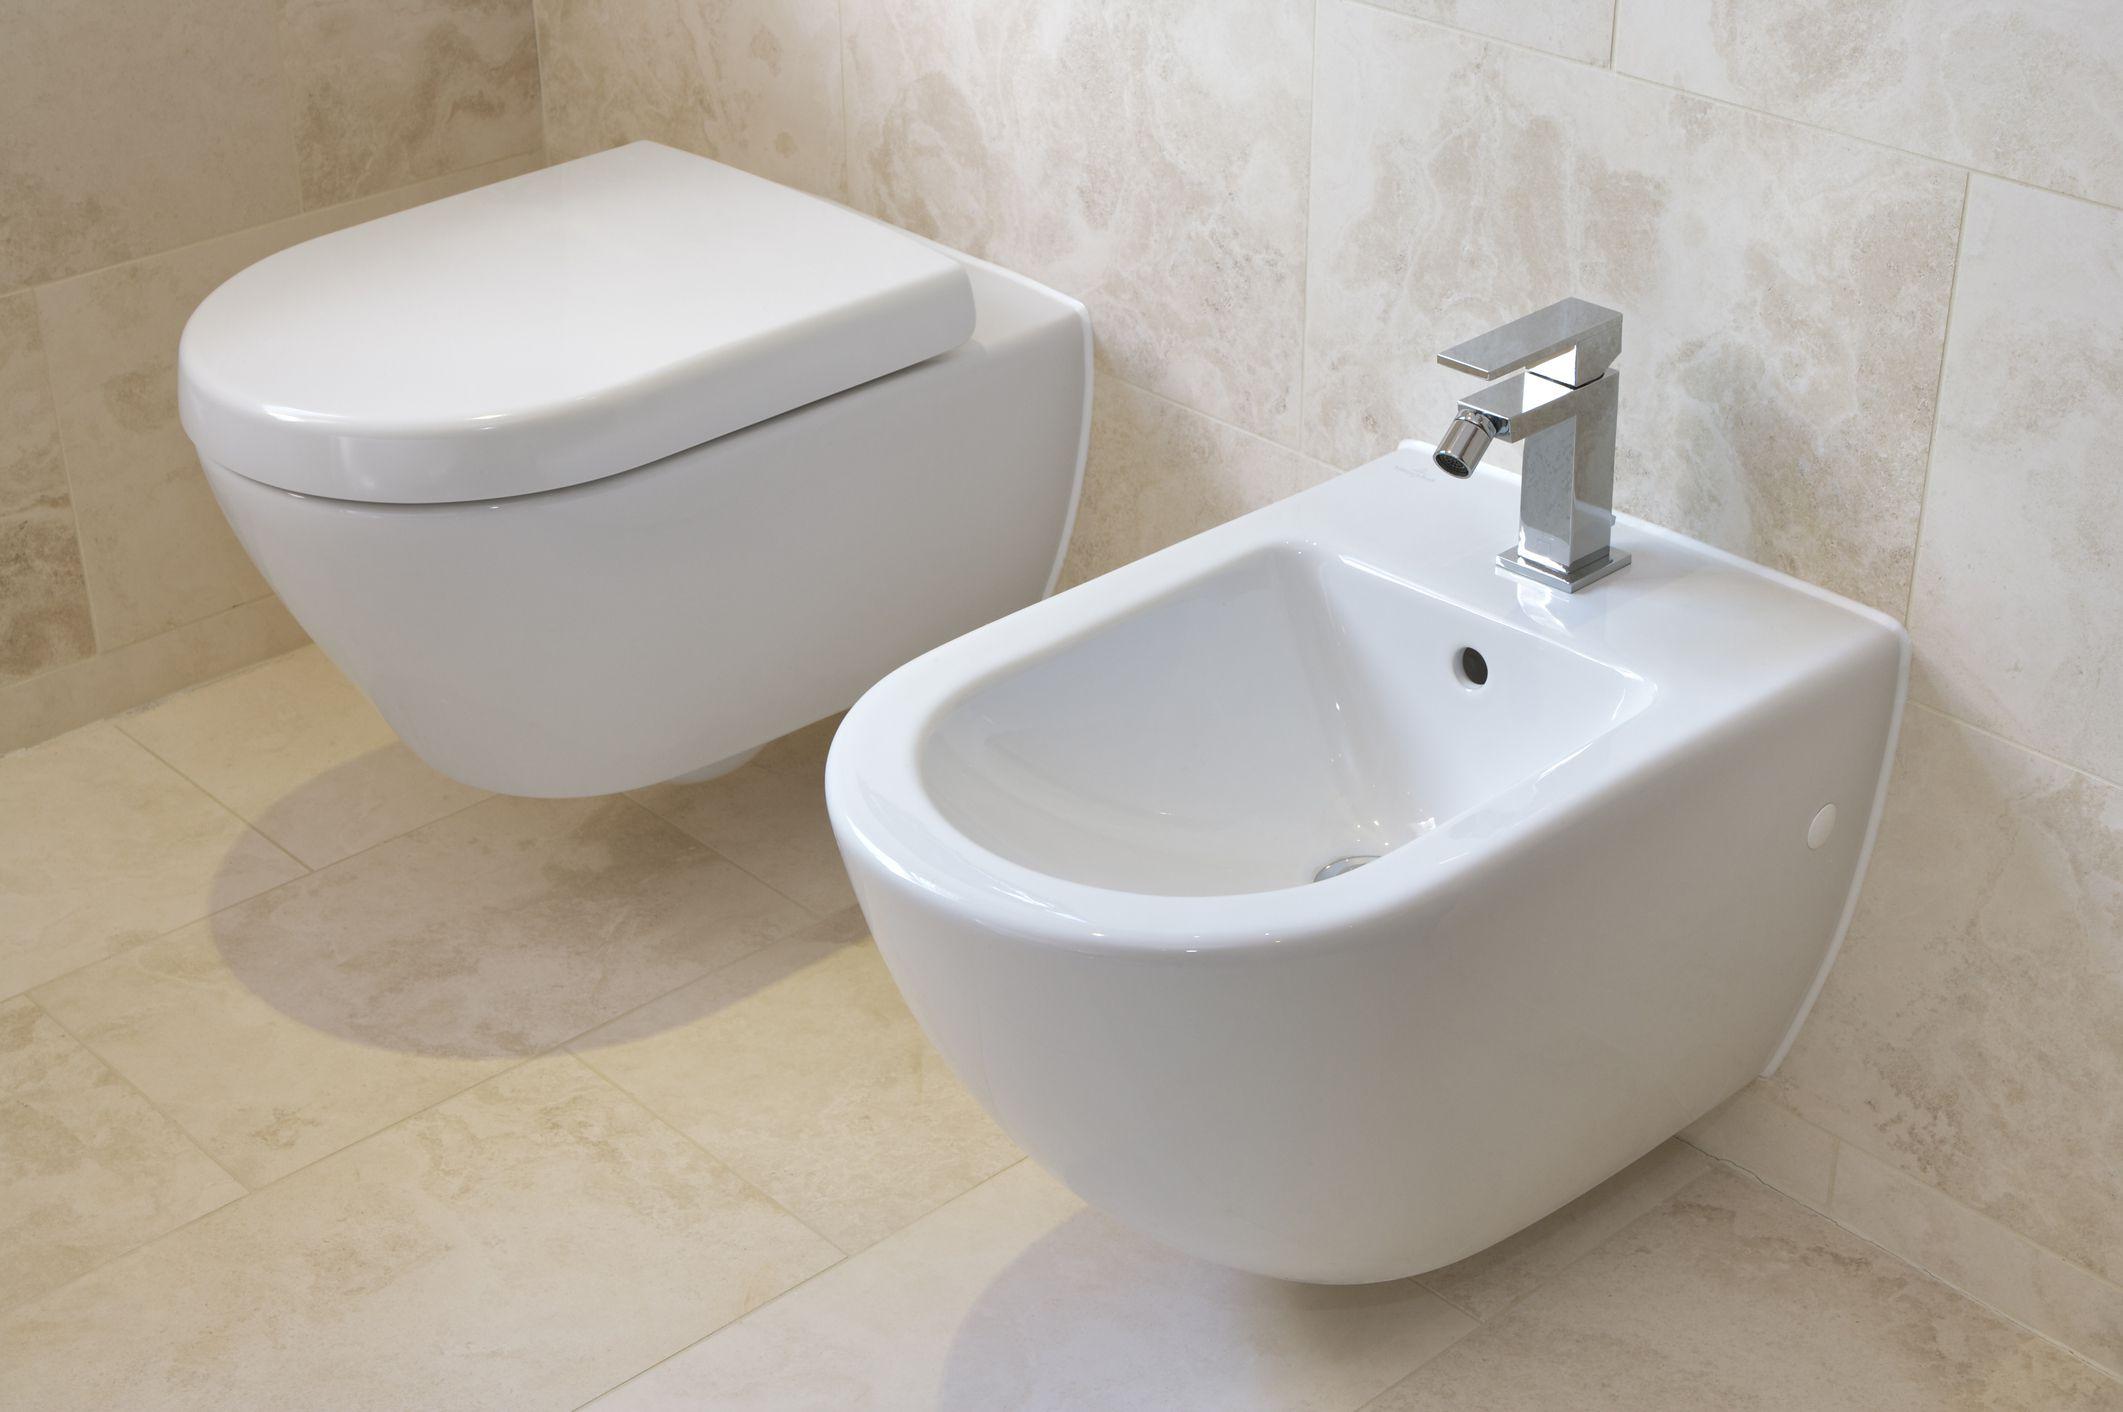 chrome shataff douche head bidet spray brass hand toilet muslim kit shower bathroom itm